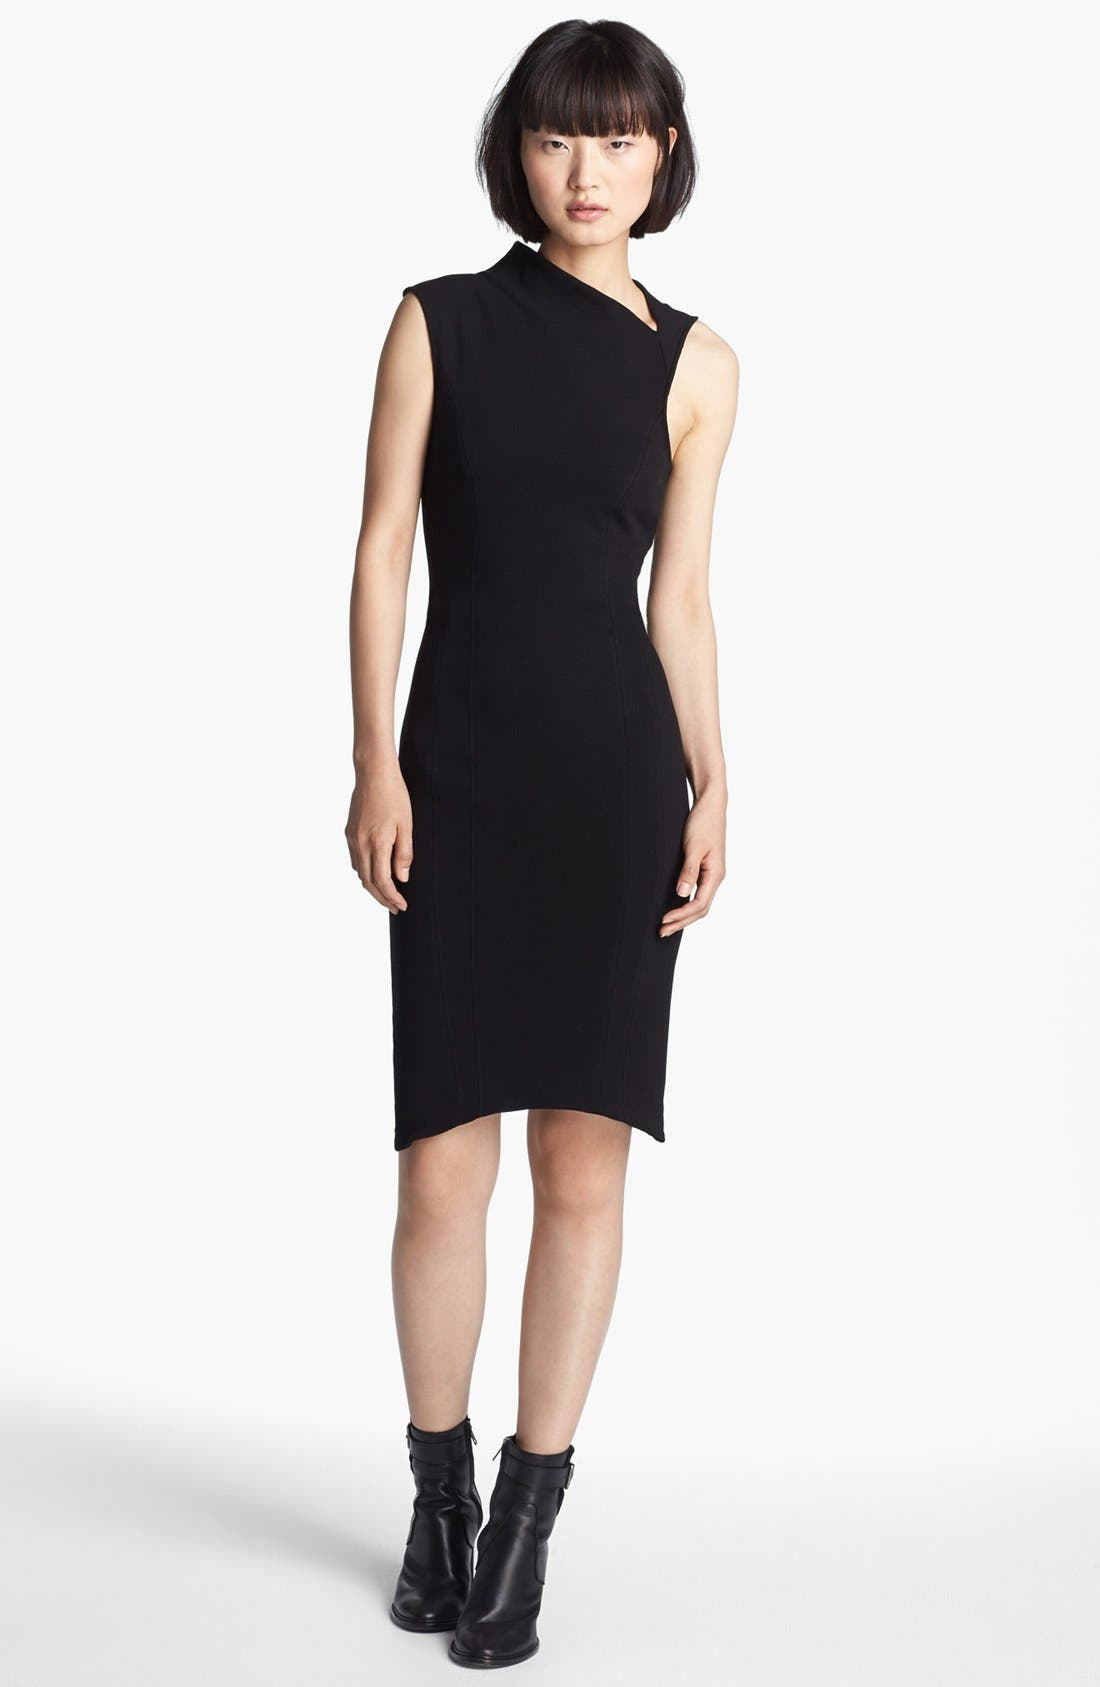 Alternate Image 1 Selected - HELMUT Helmut Lang 'Gala' Knit Dress